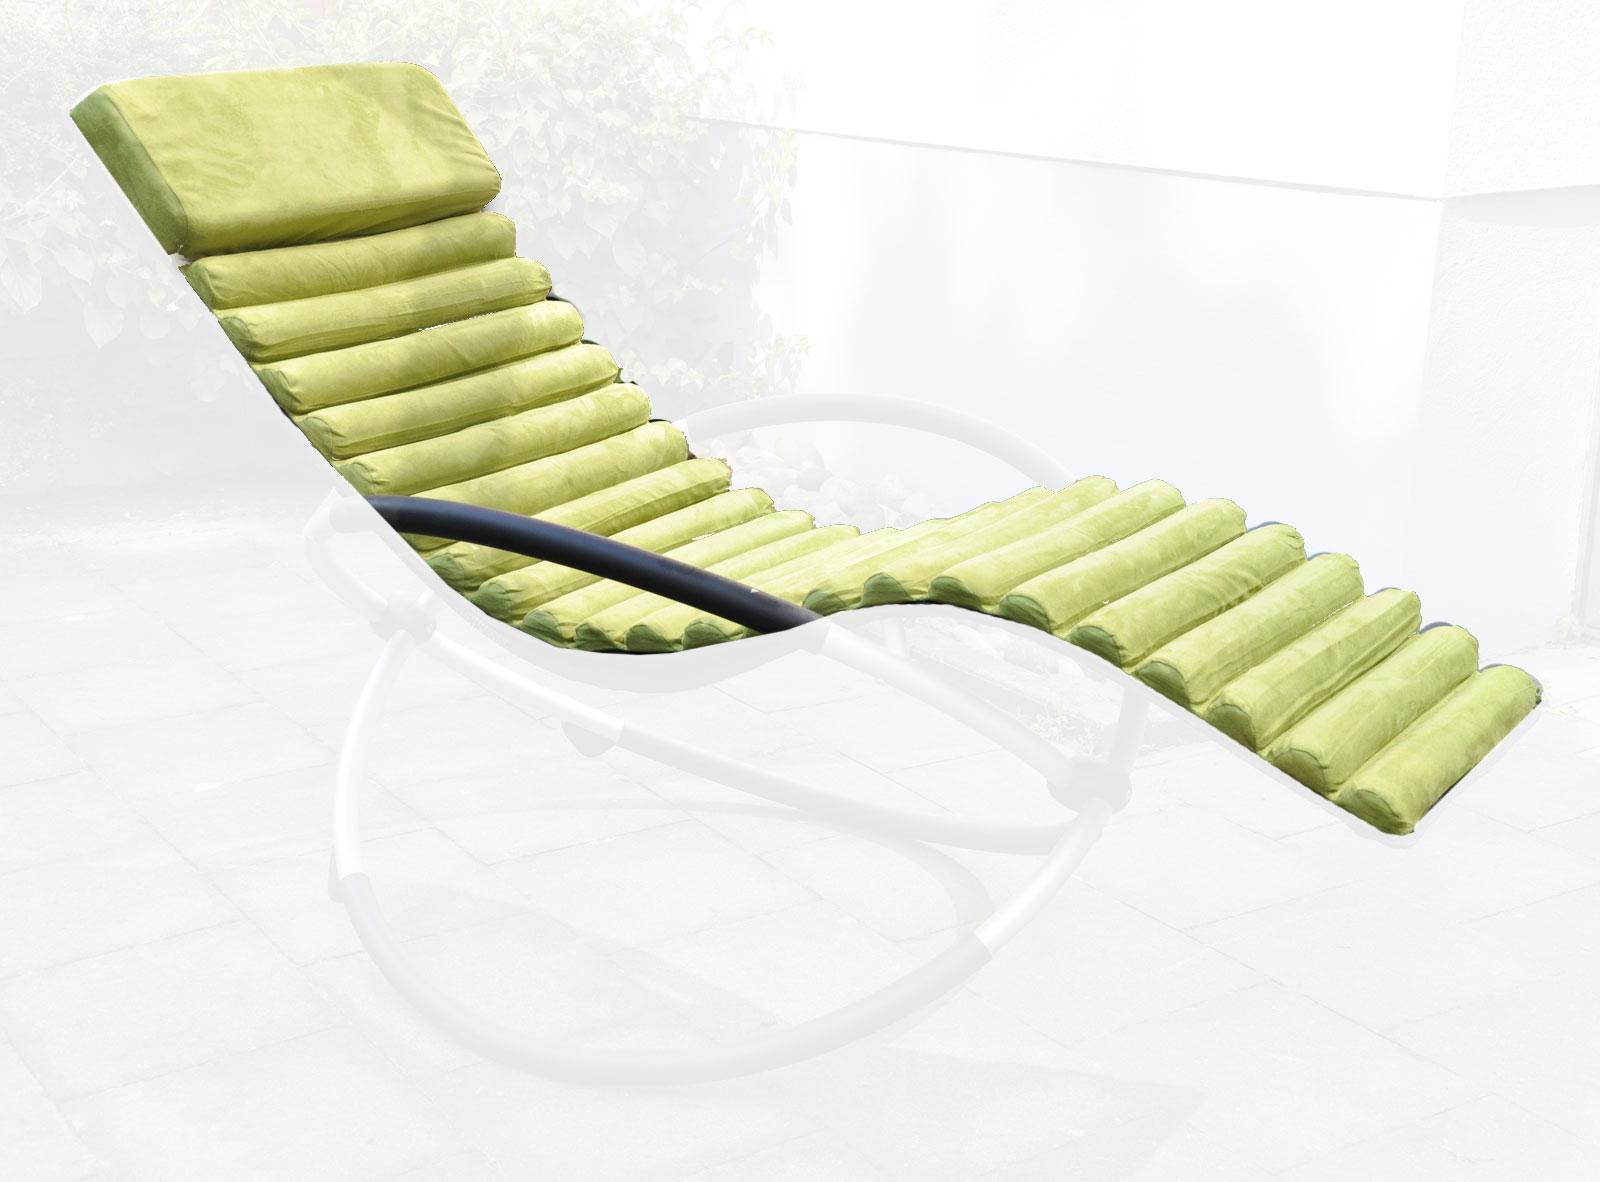 polster auflagen schaukelstuhlkissen f r leco schaukelstuhl gr n bei. Black Bedroom Furniture Sets. Home Design Ideas